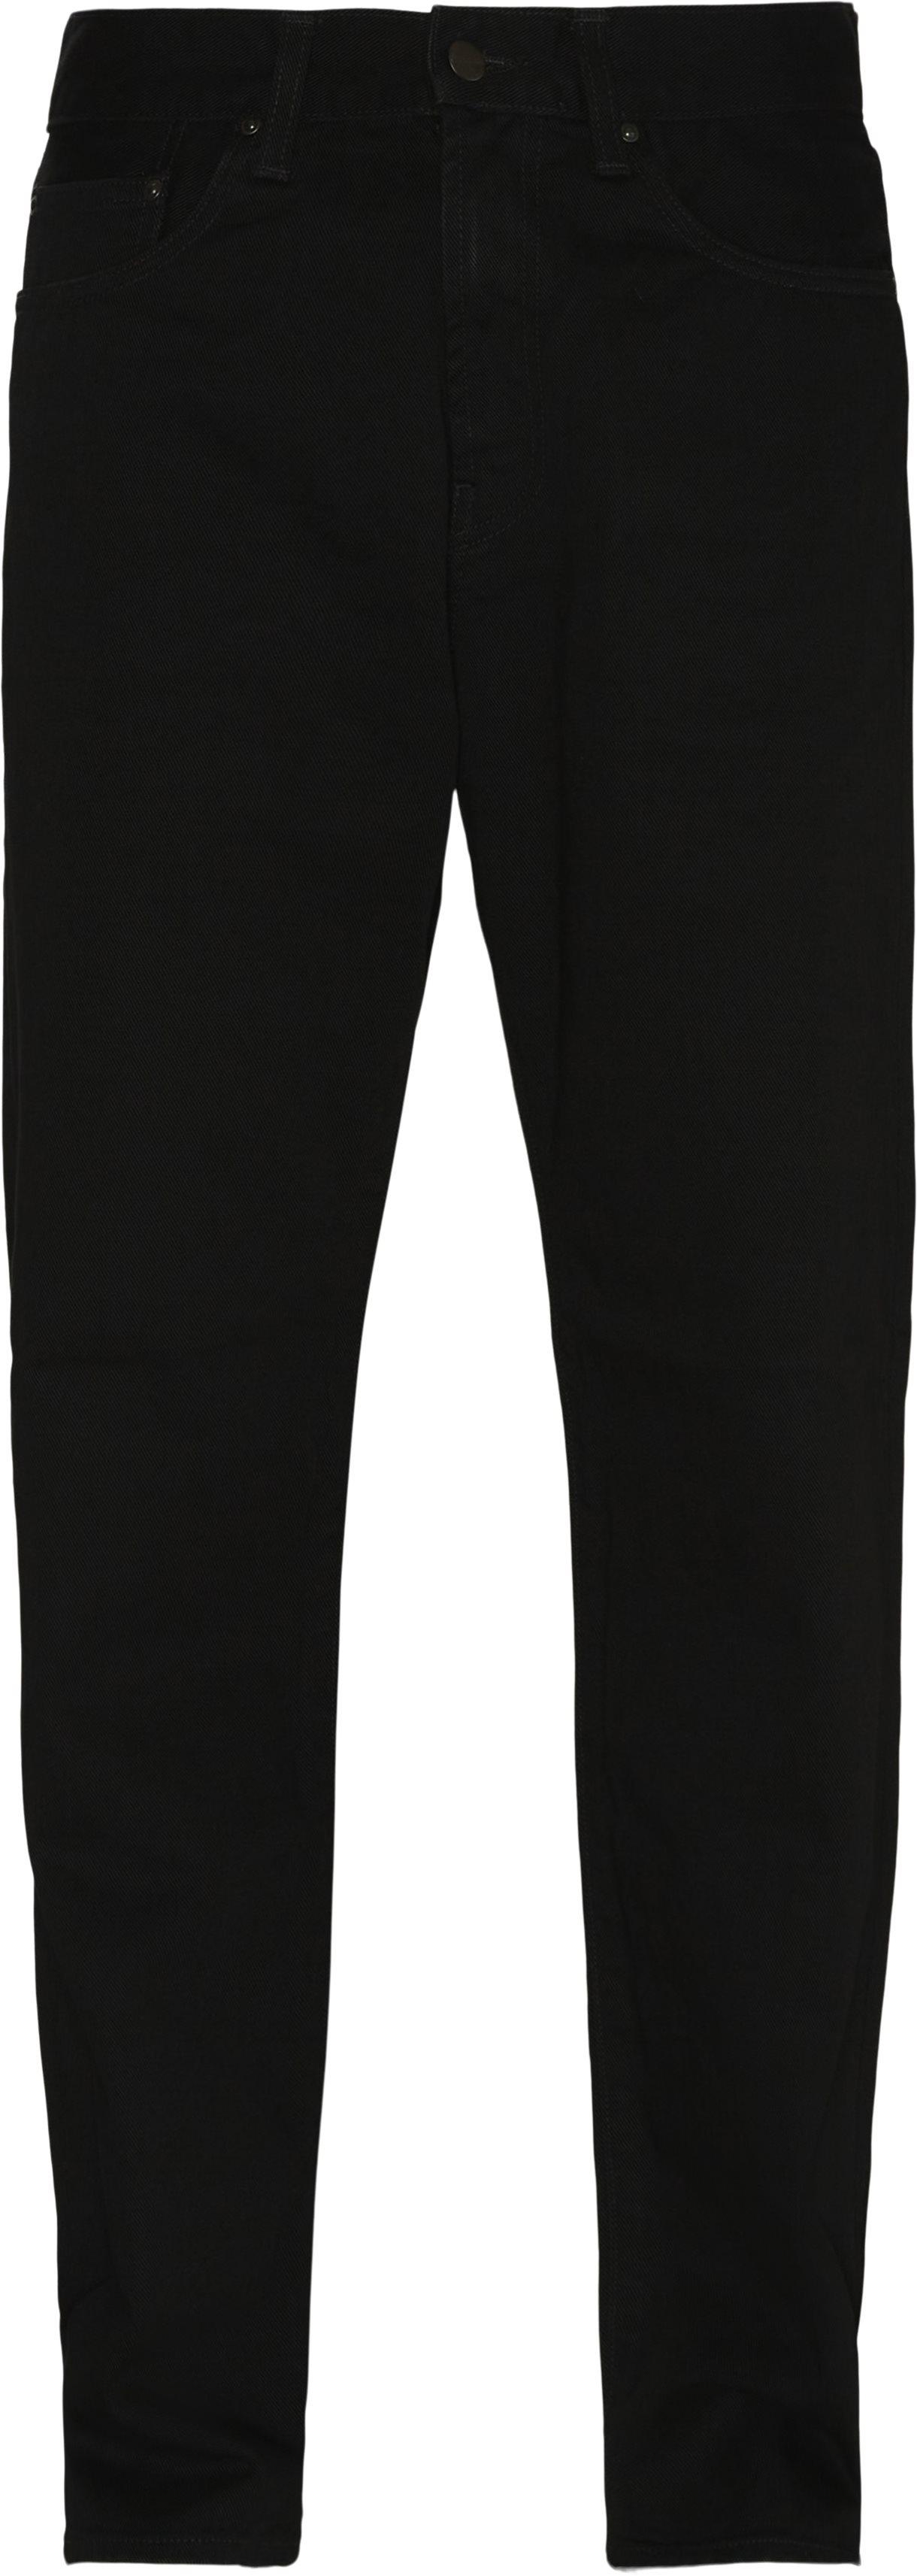 Pontiac Pant I029210 - Jeans - Straight fit - Sort